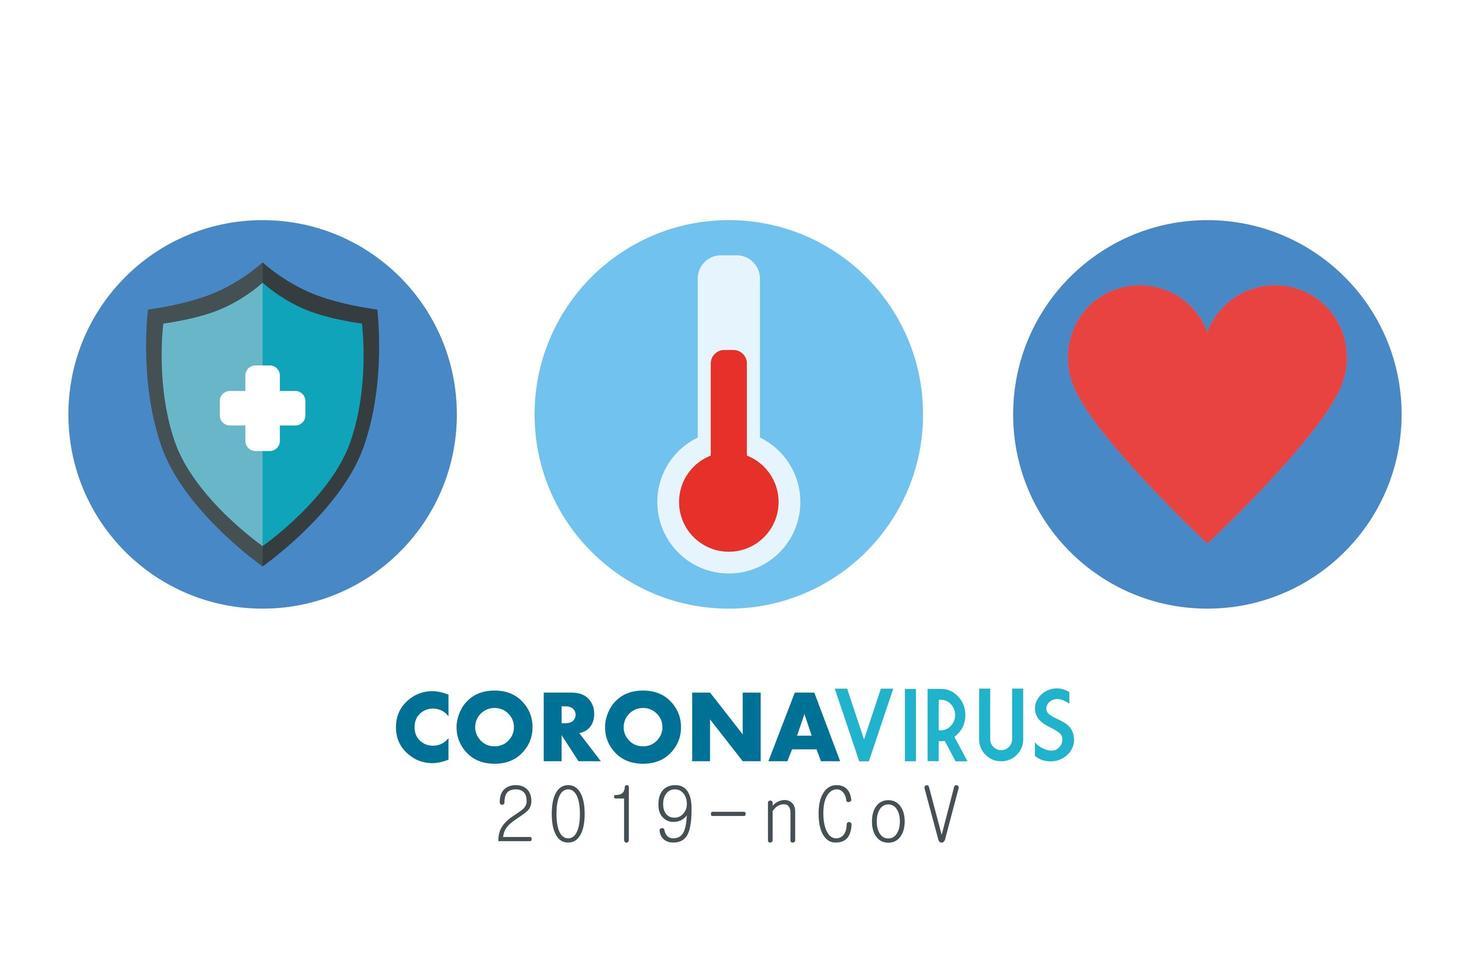 banner médico de coronavírus com ícones vetor